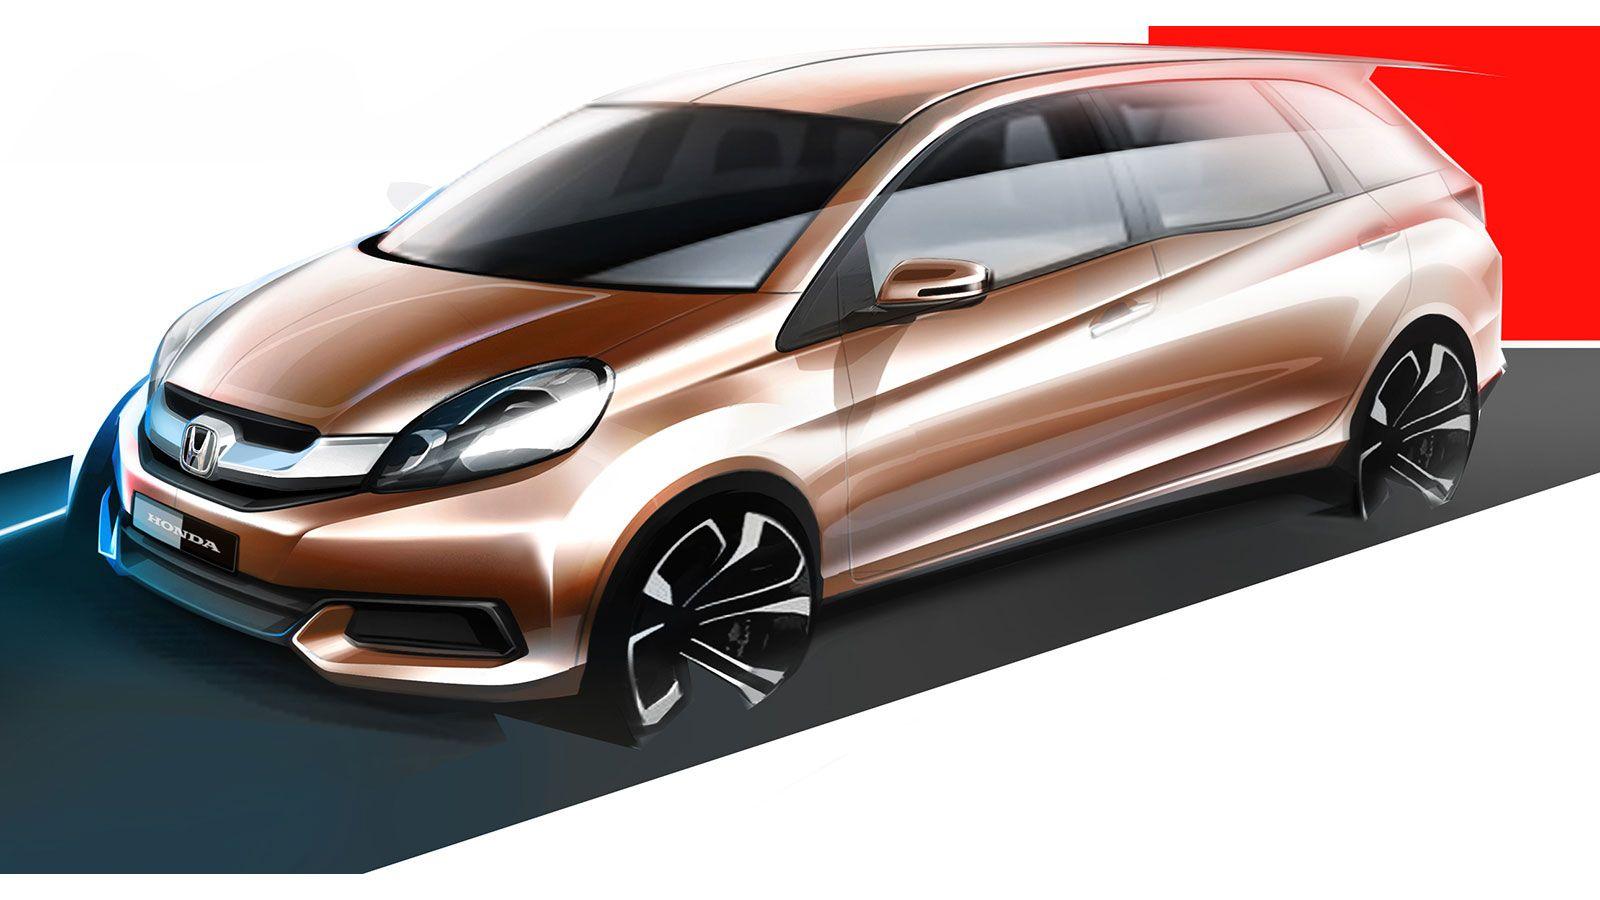 Honda Mpv Design Sketch Transportation Design Car Design Design Sketch